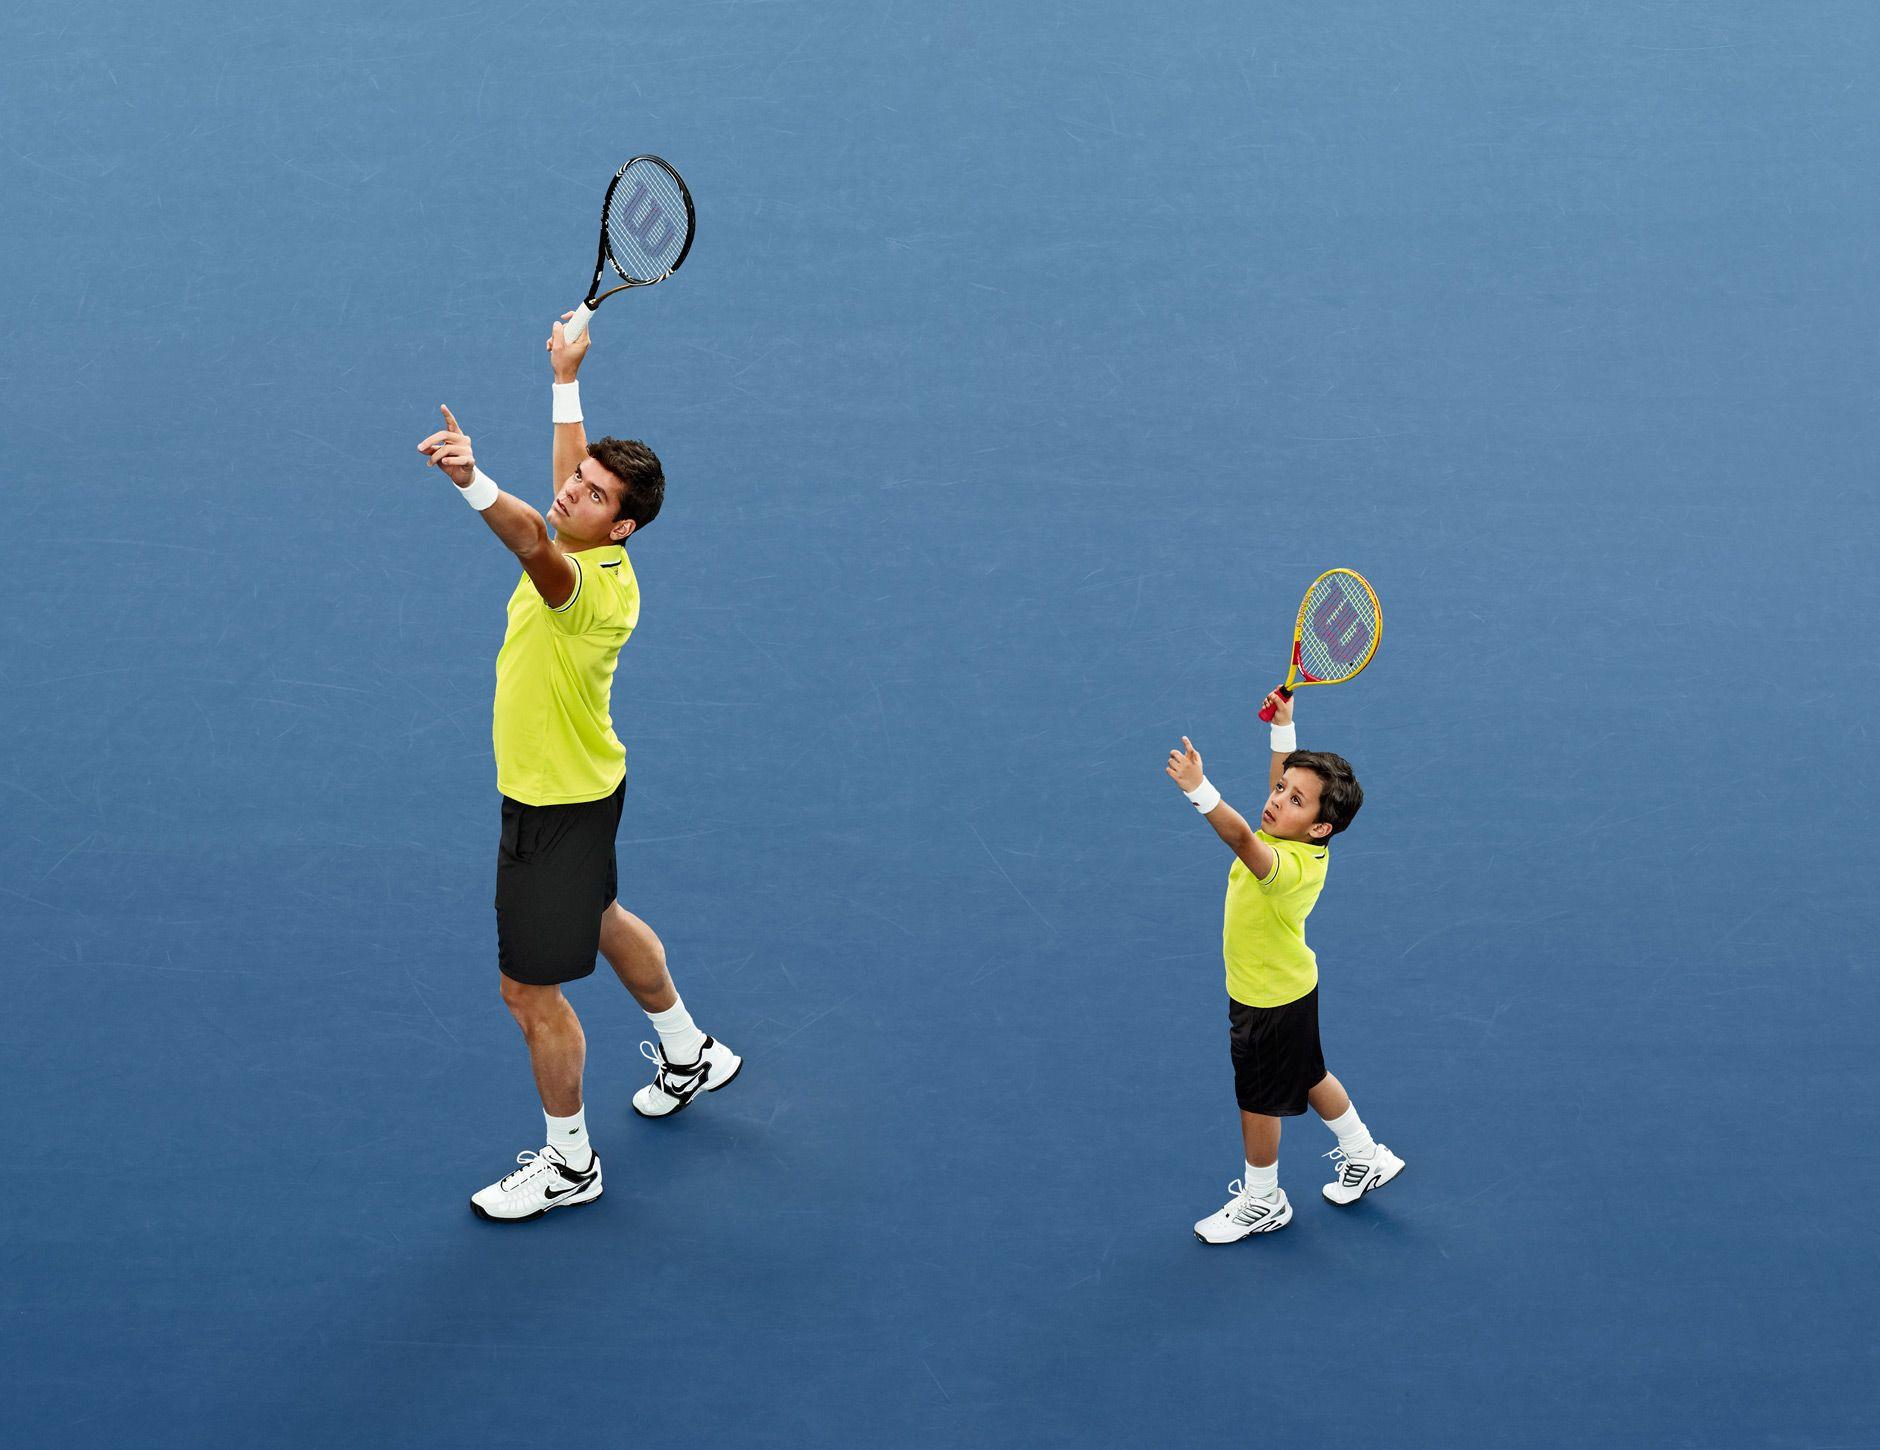 Encourage kids to play tennis, having tennis fun